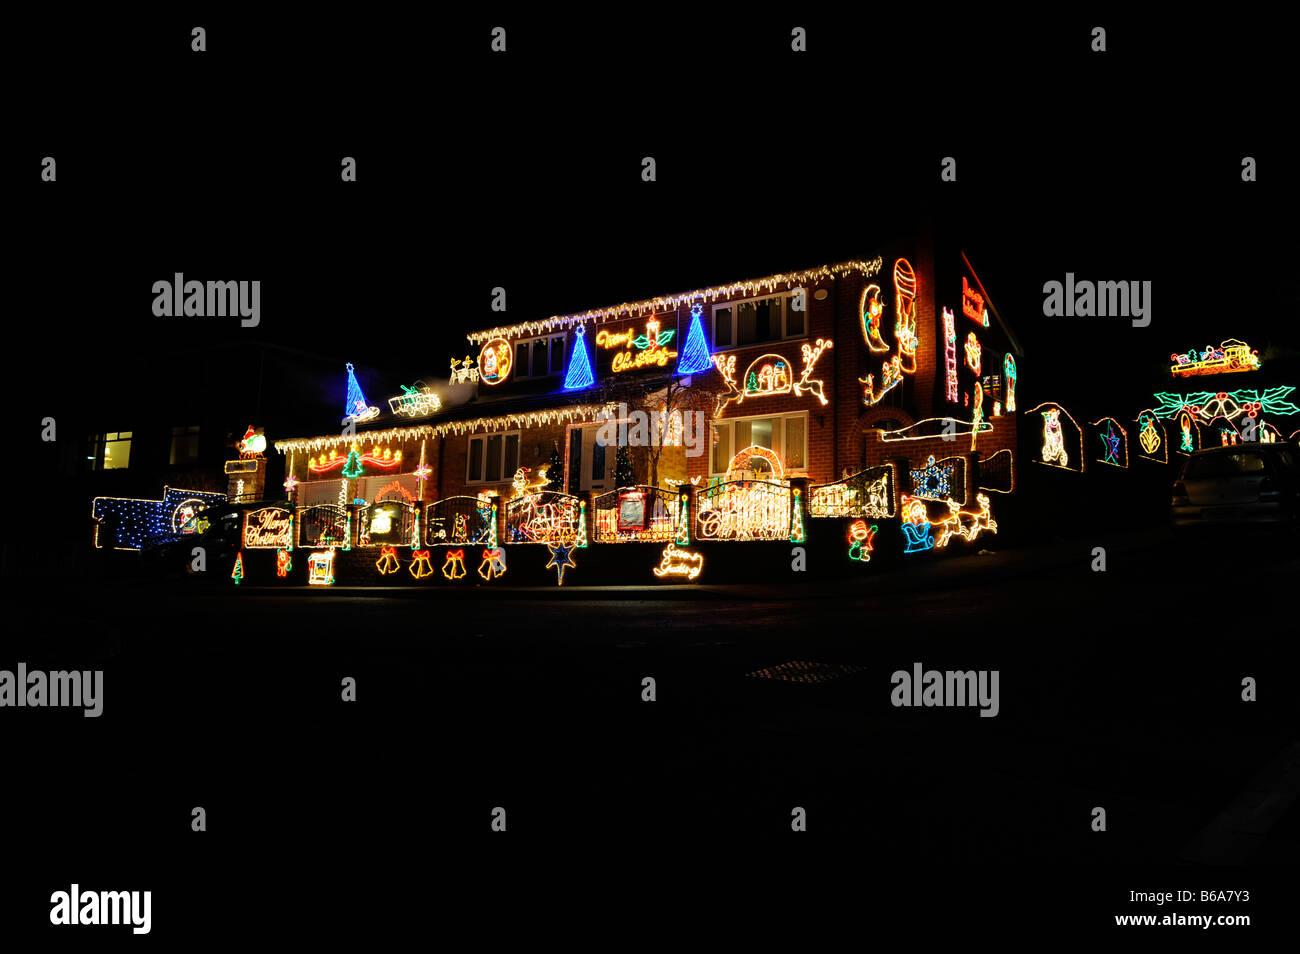 Christmas Lights Festive Outside Stock Photos & Christmas Lights ...